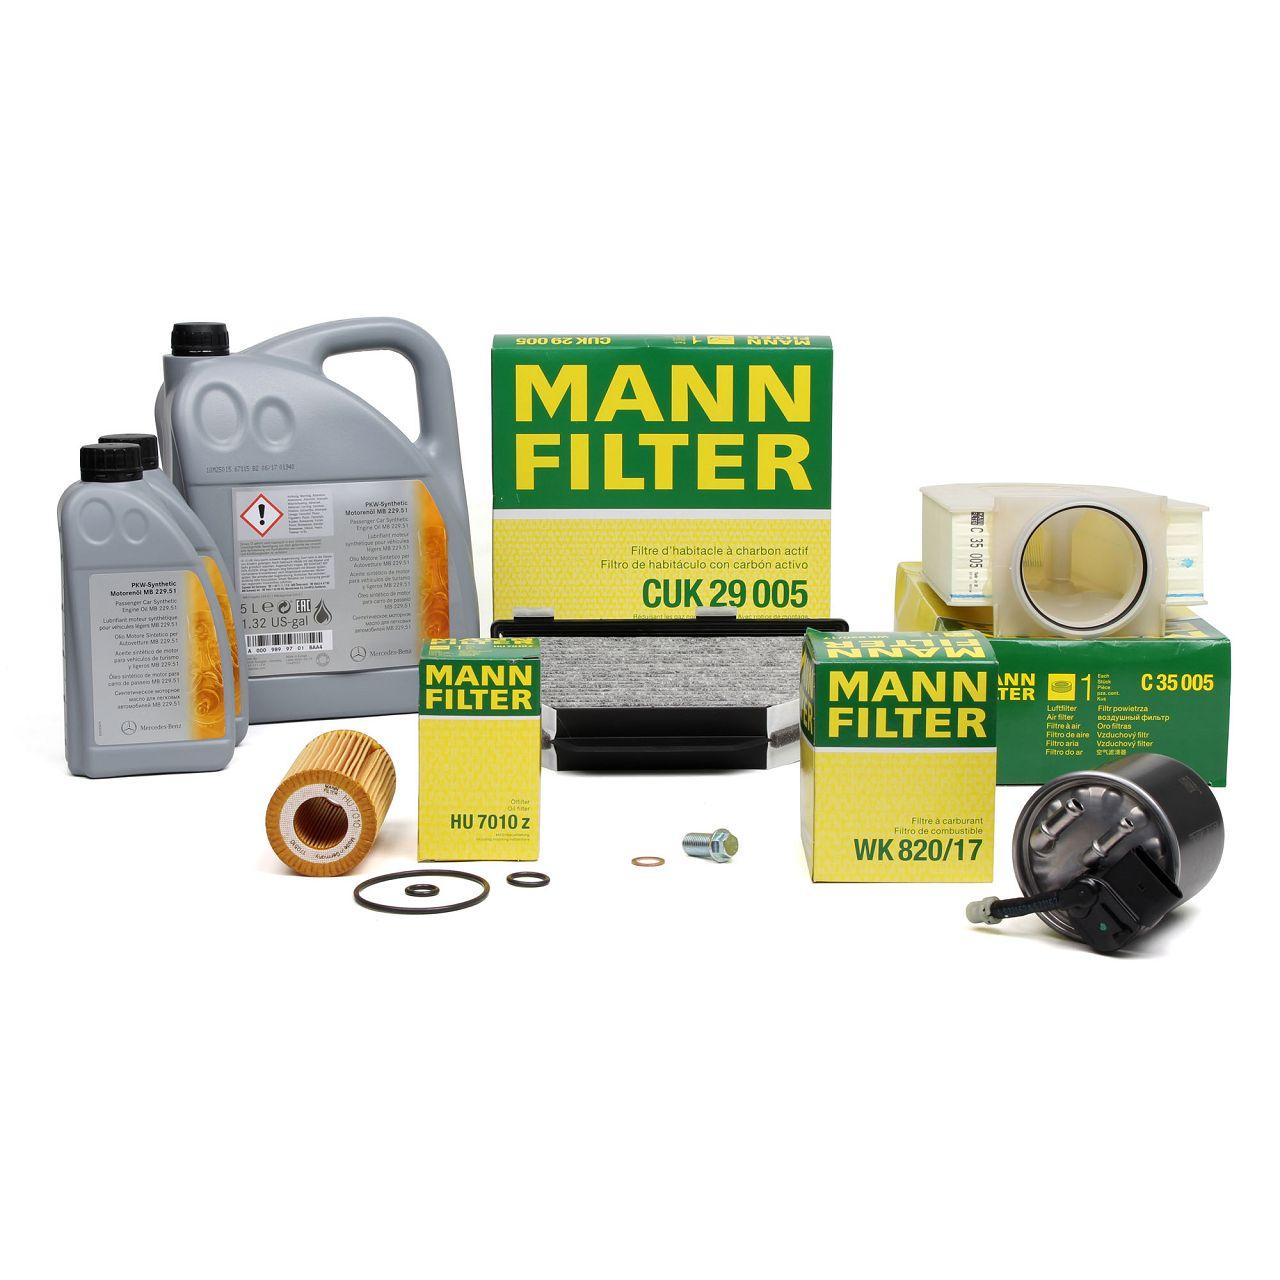 MANN Filterset + 7L ORIGINAL Mercedes-Benz Motoröl 5W30 C-Klasse W204 CLS C218 W212 X204